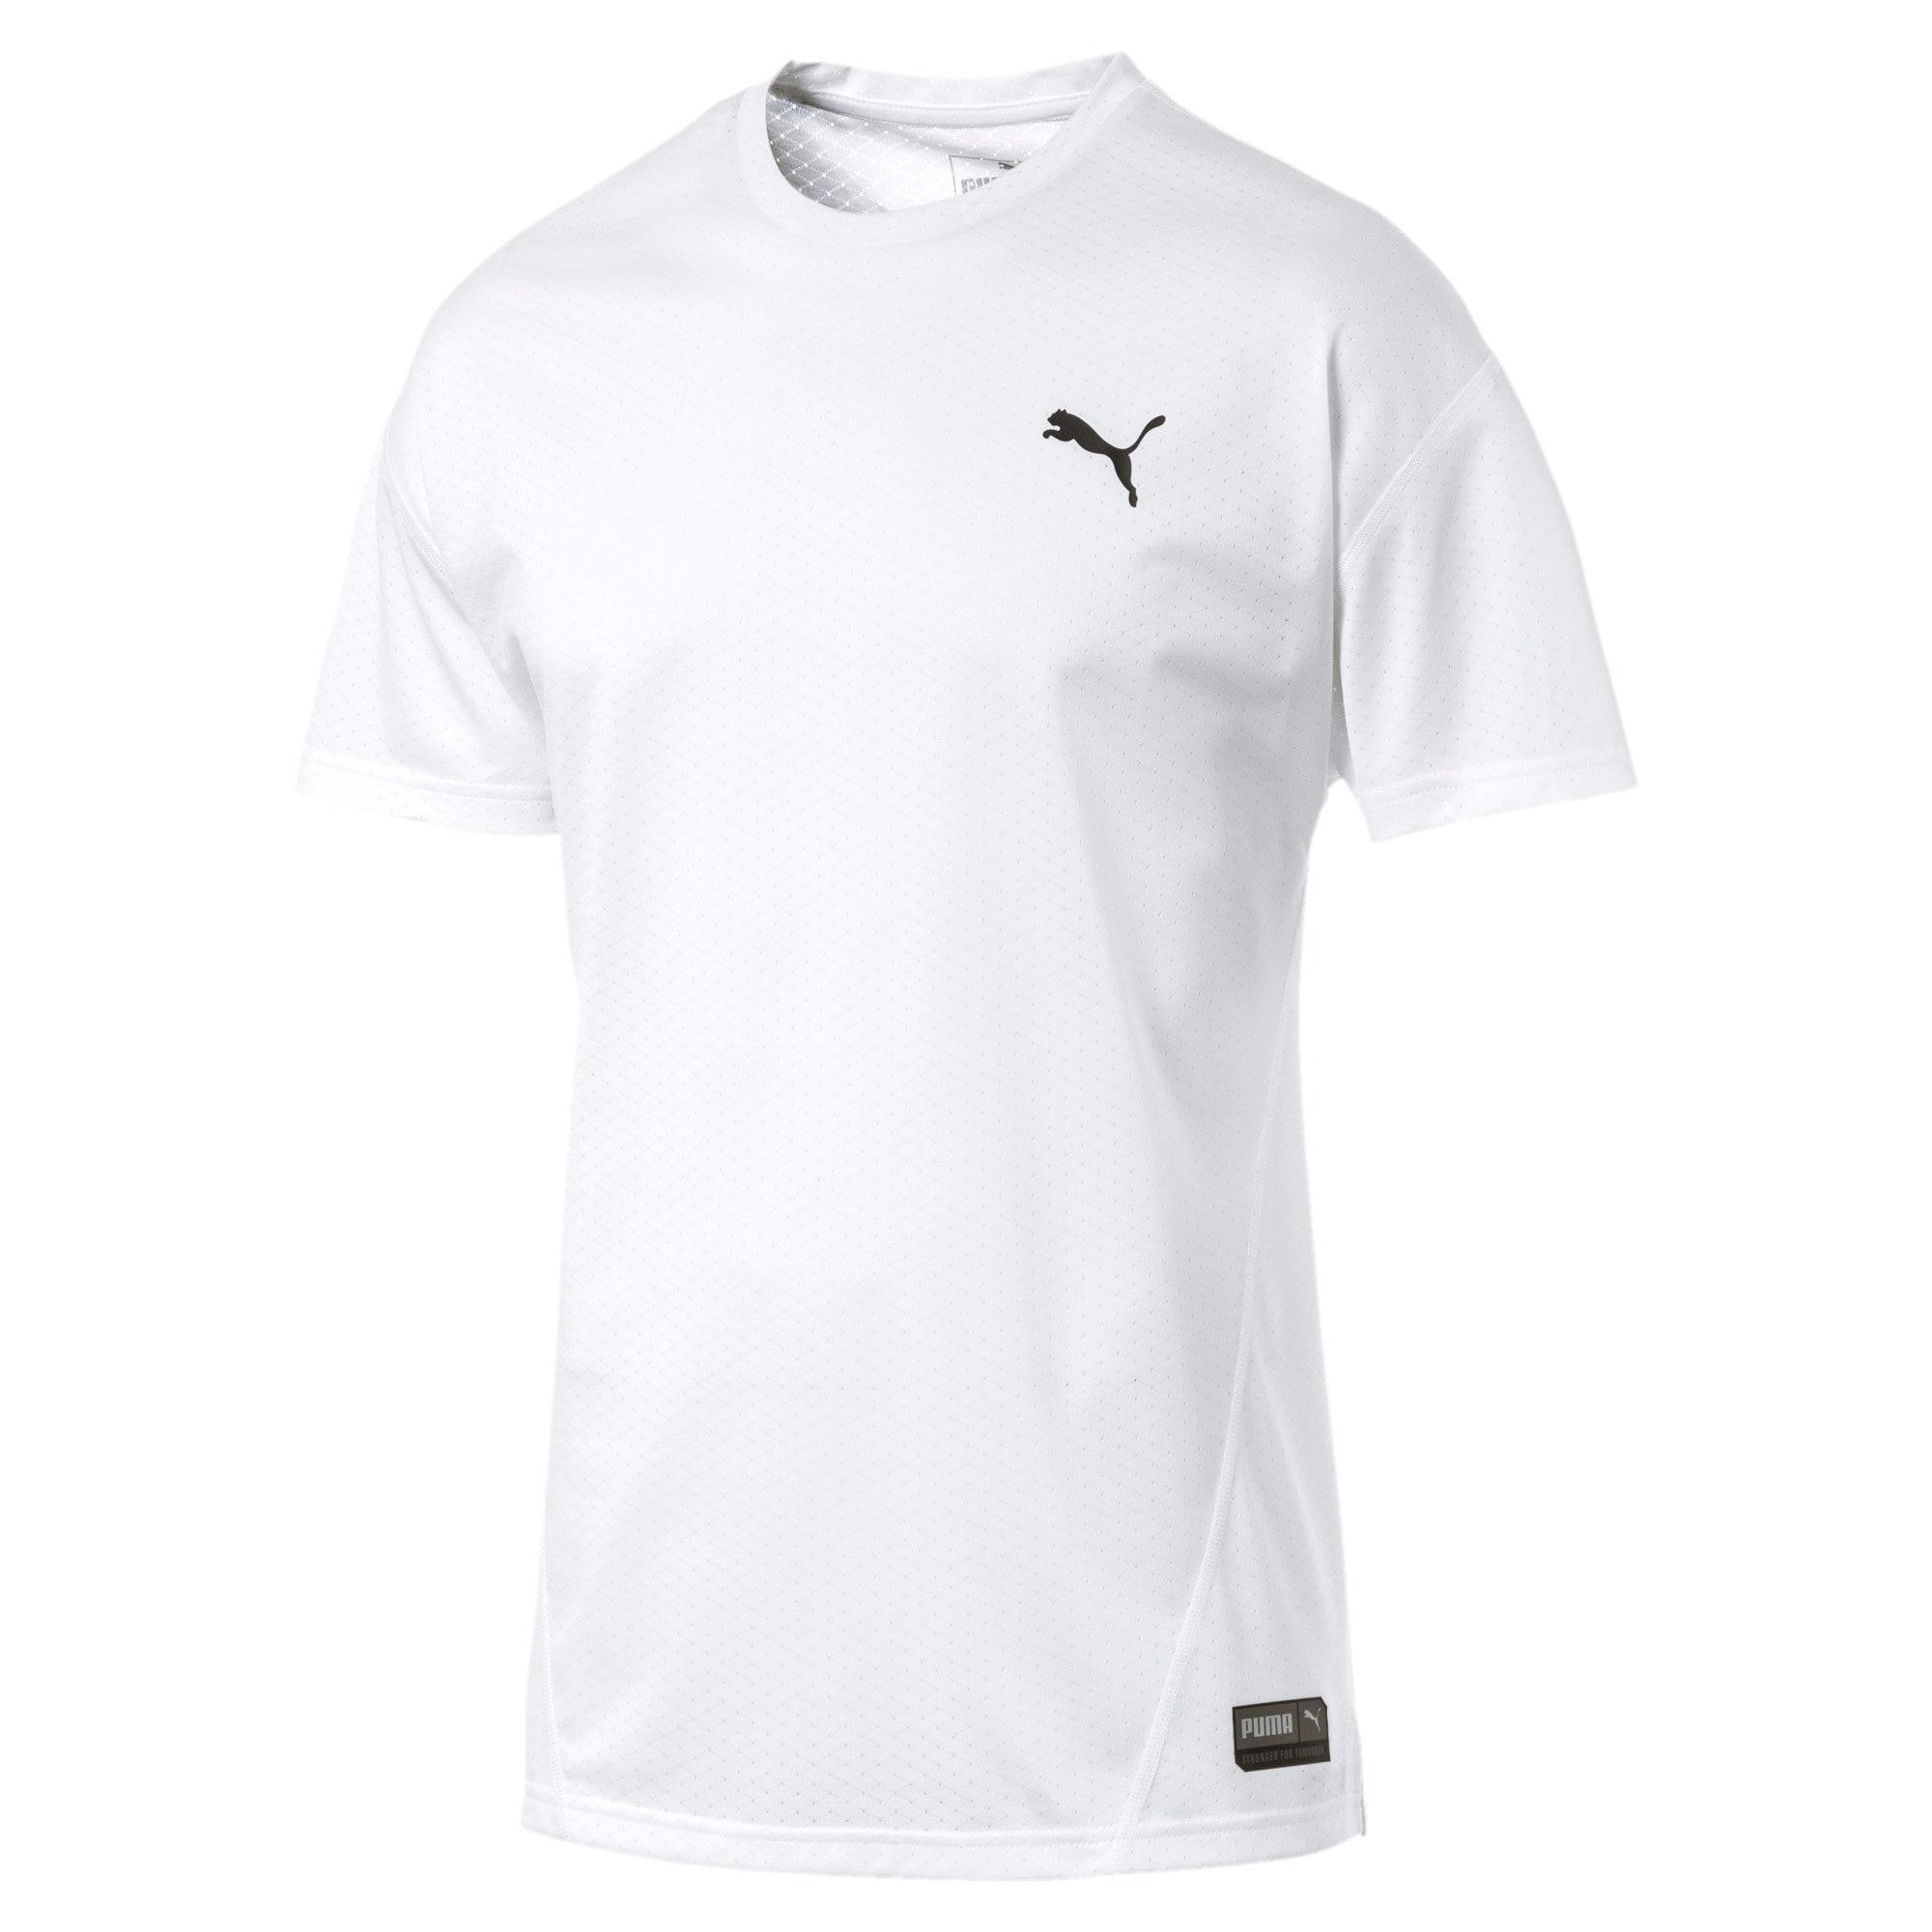 Thumbnail 5 of A.C.E. Herren Trainingsshirt, Puma White, medium